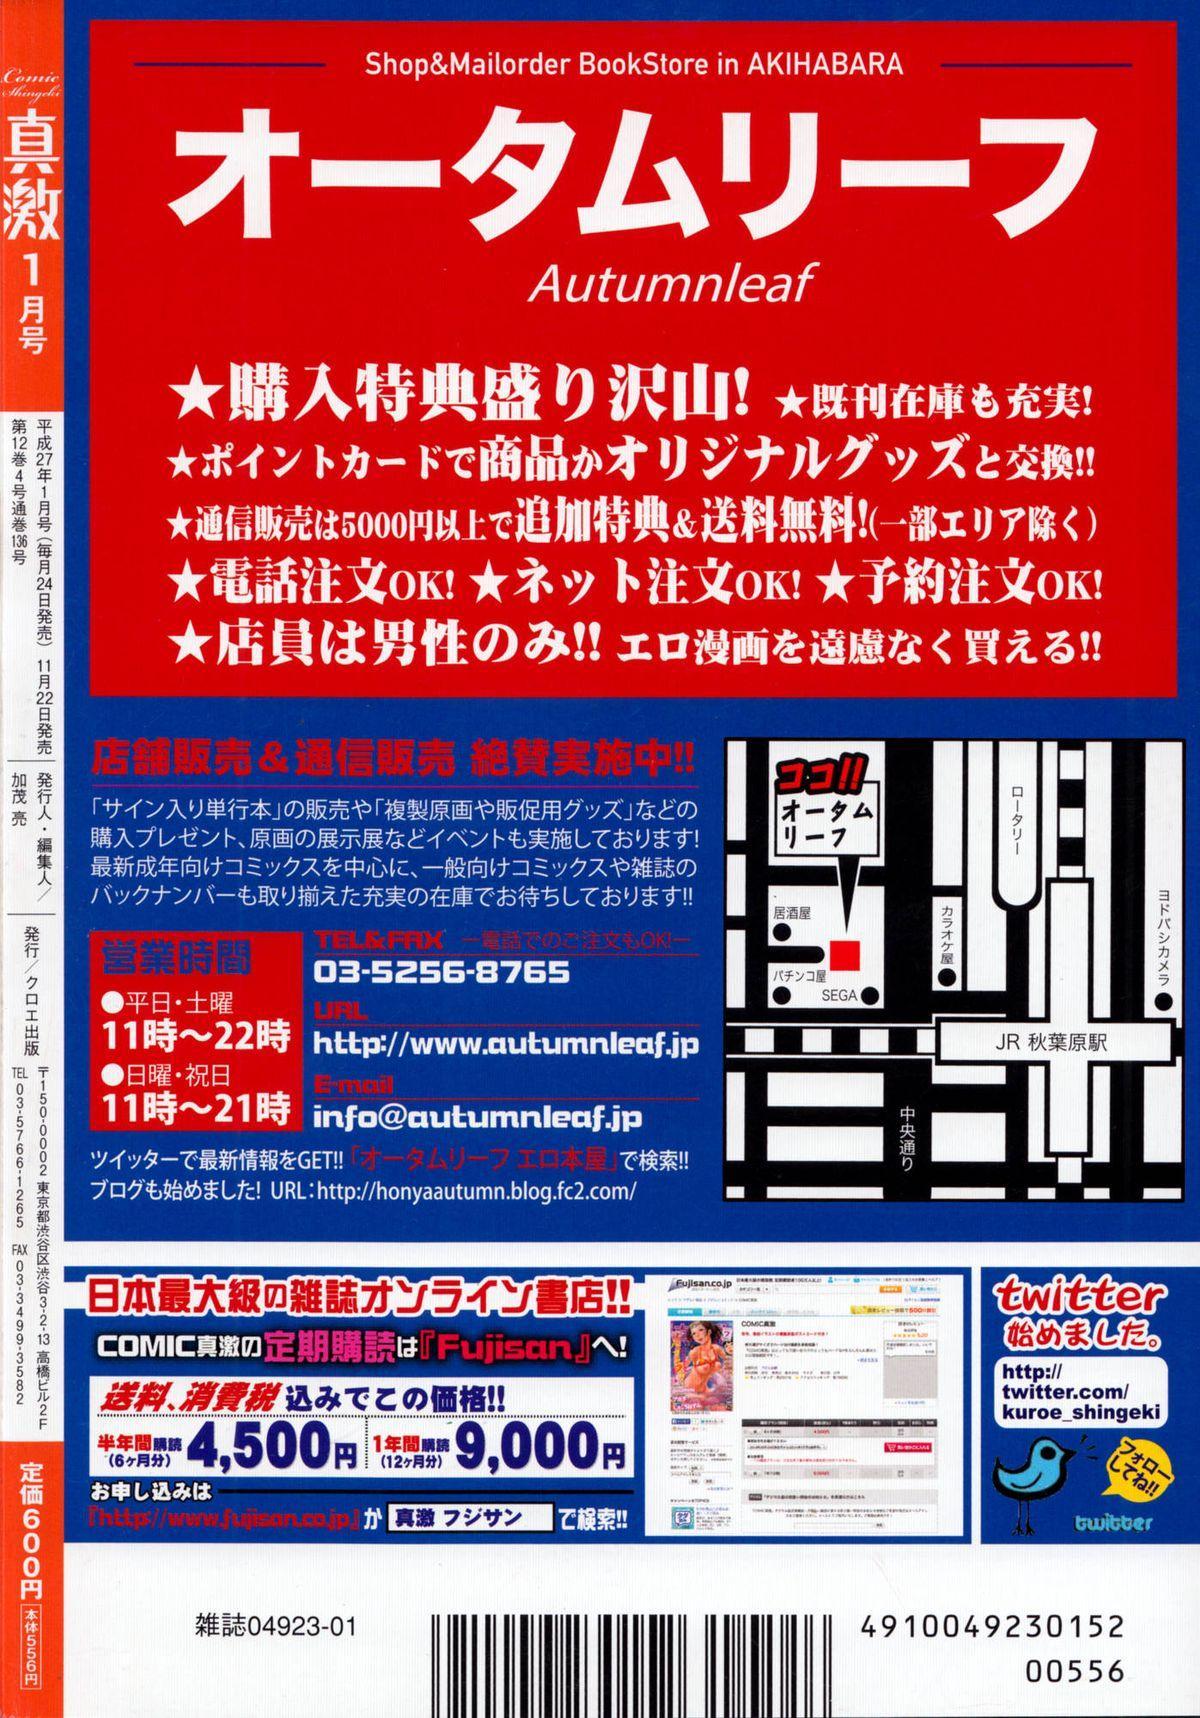 COMIC Shingeki 2015-01 363